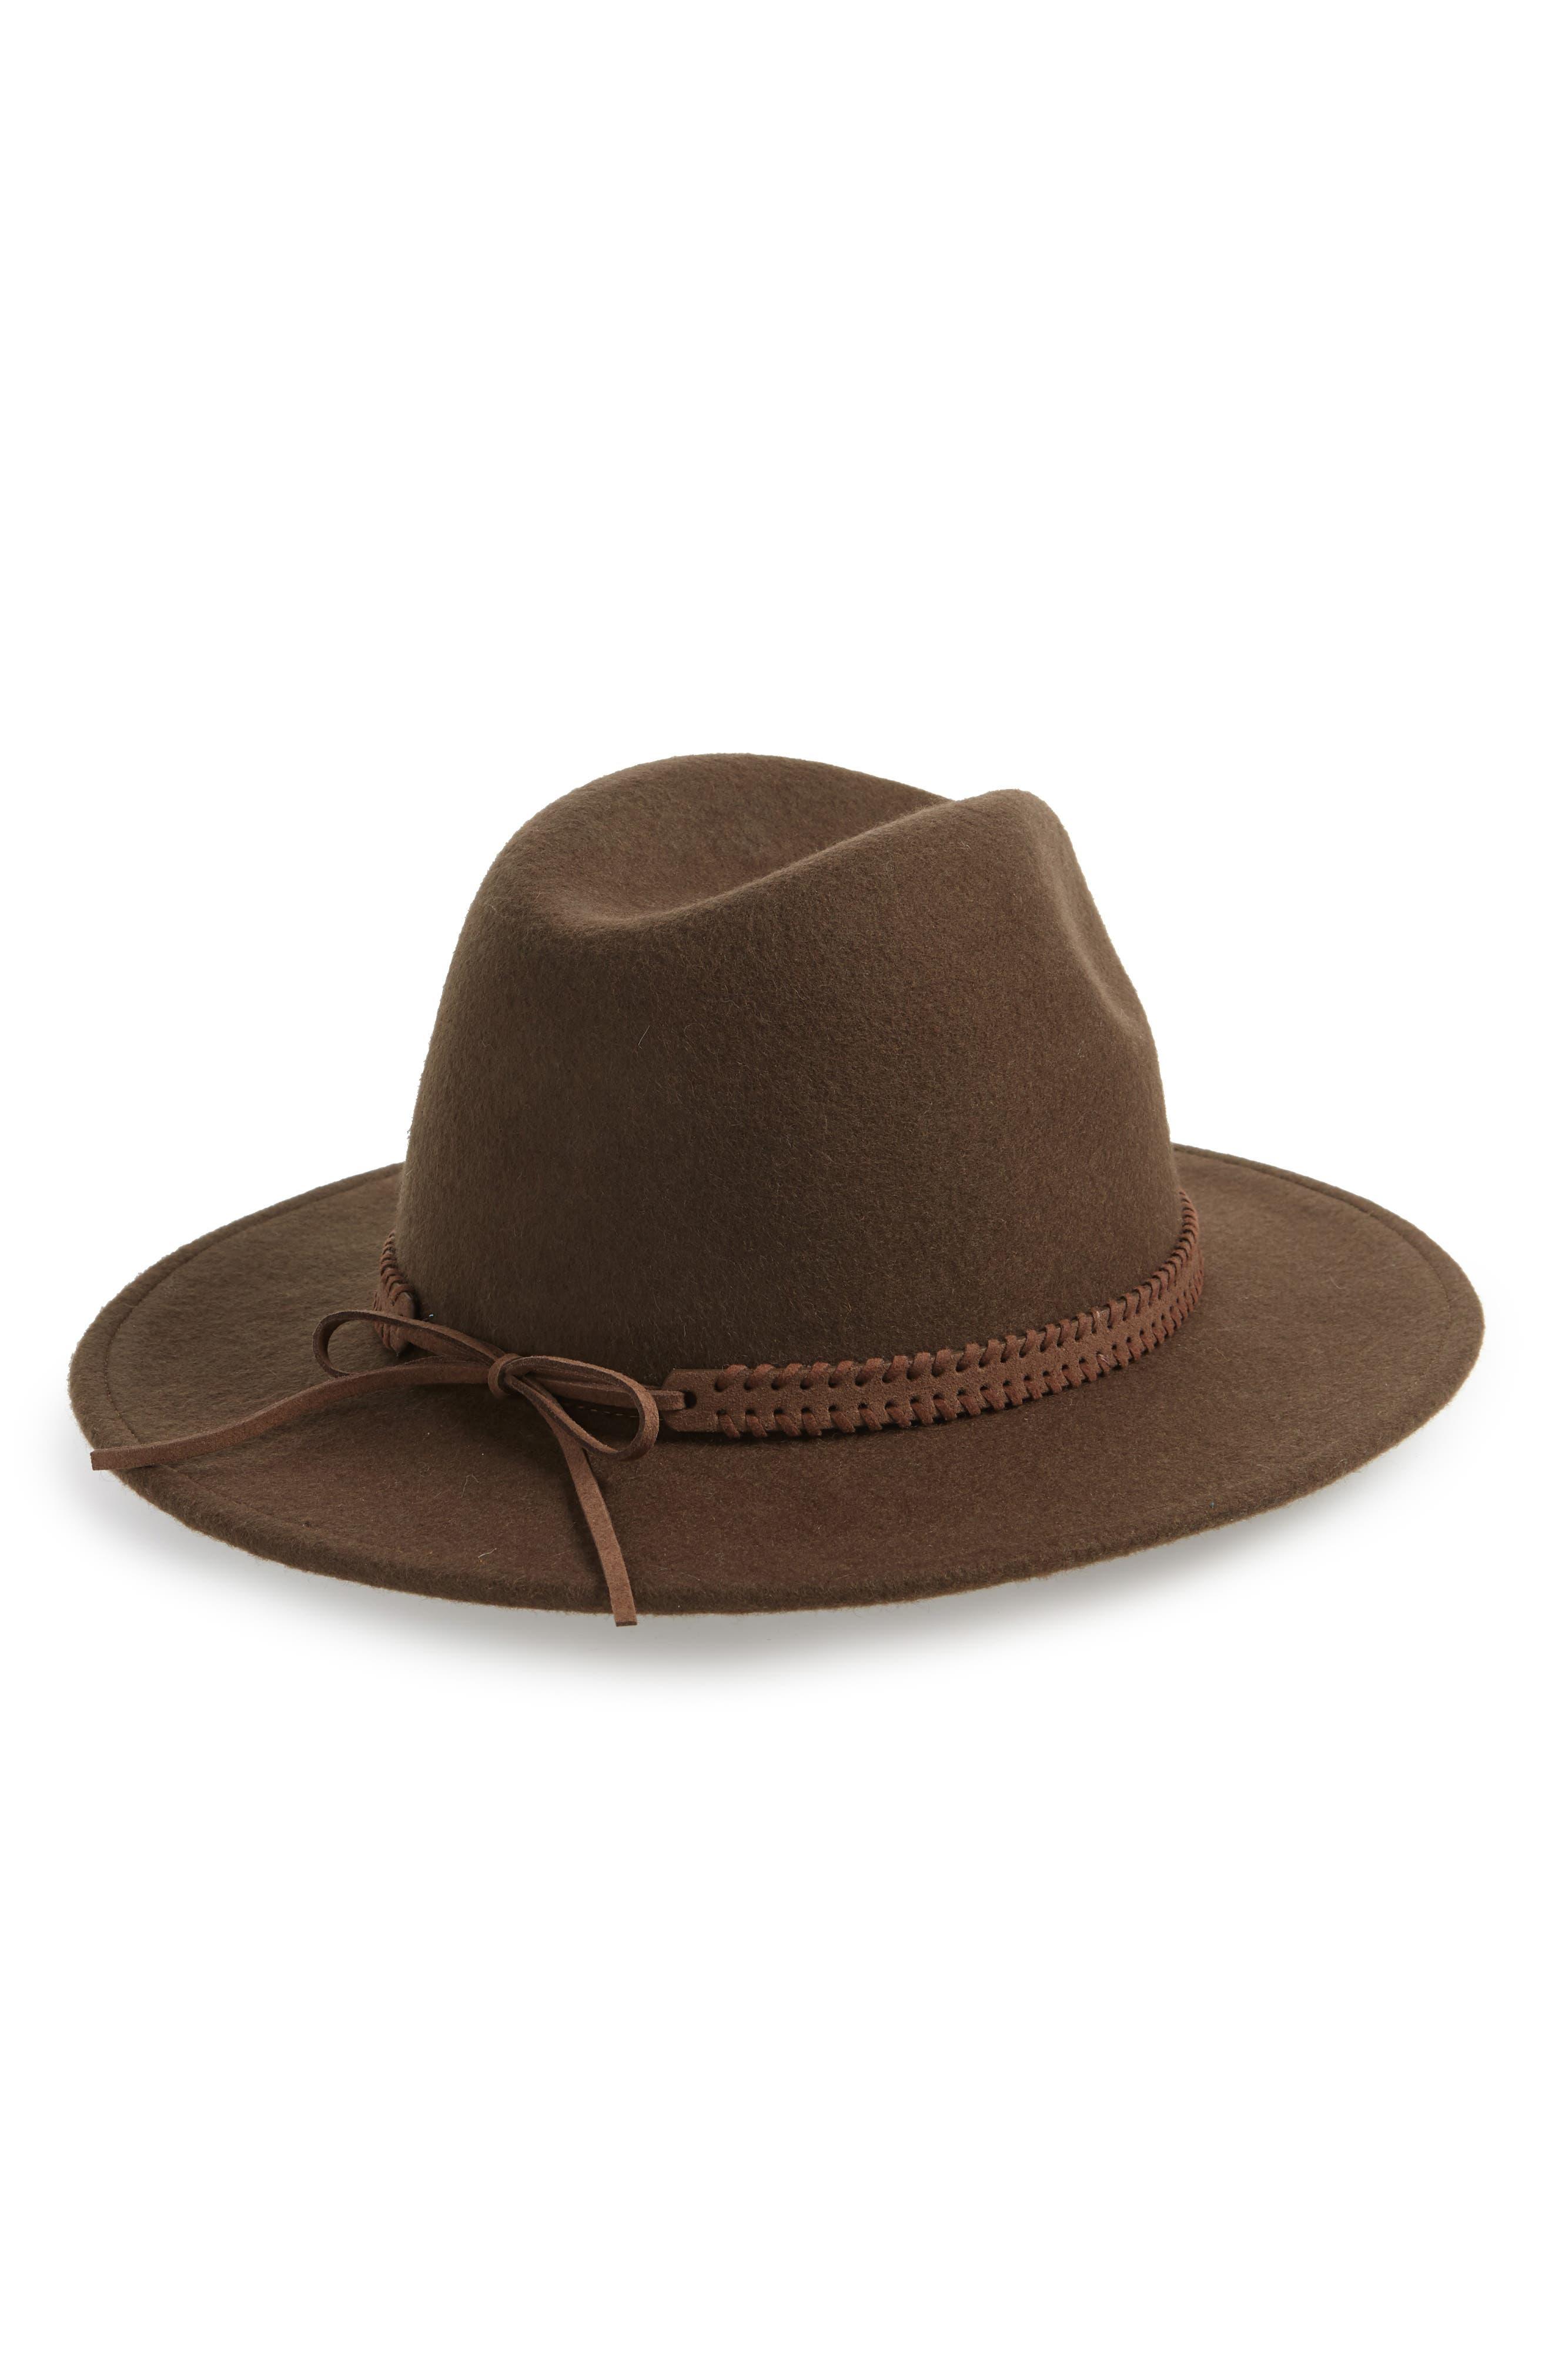 Felt Panama Hat,                             Alternate thumbnail 2, color,                             DARK TAUPE